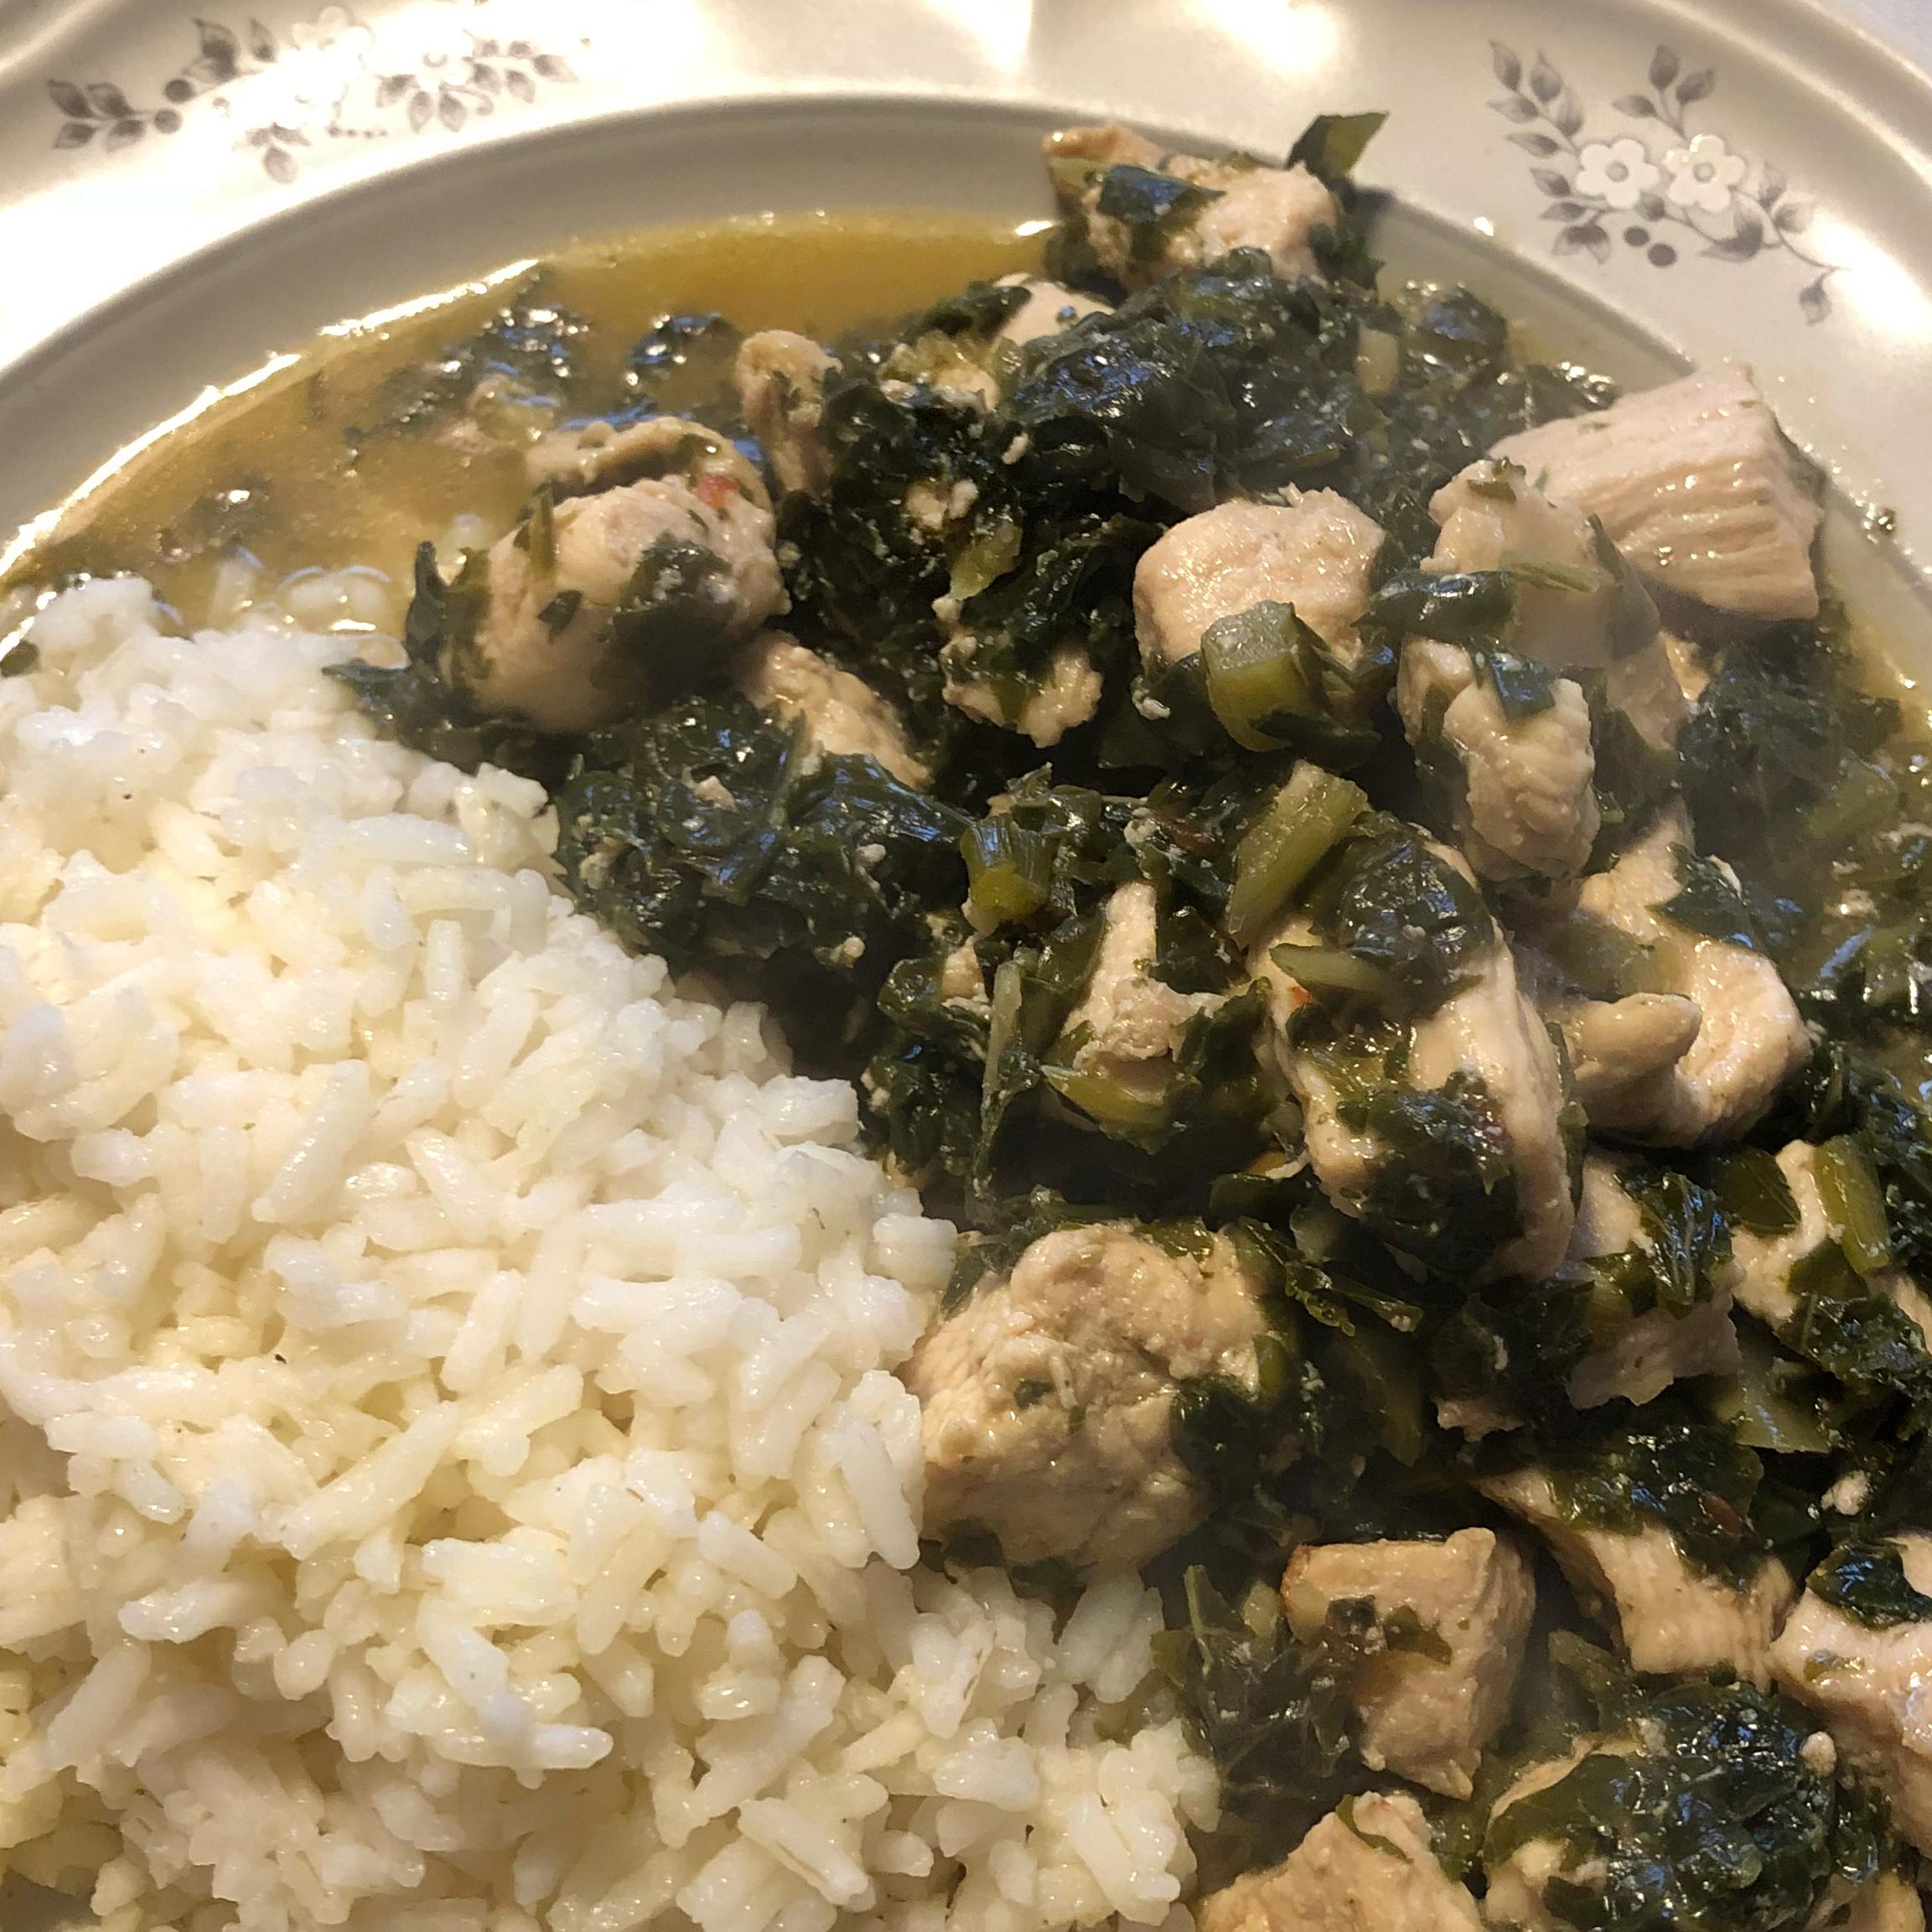 Healthier Kung Pao Chicken wasupwida